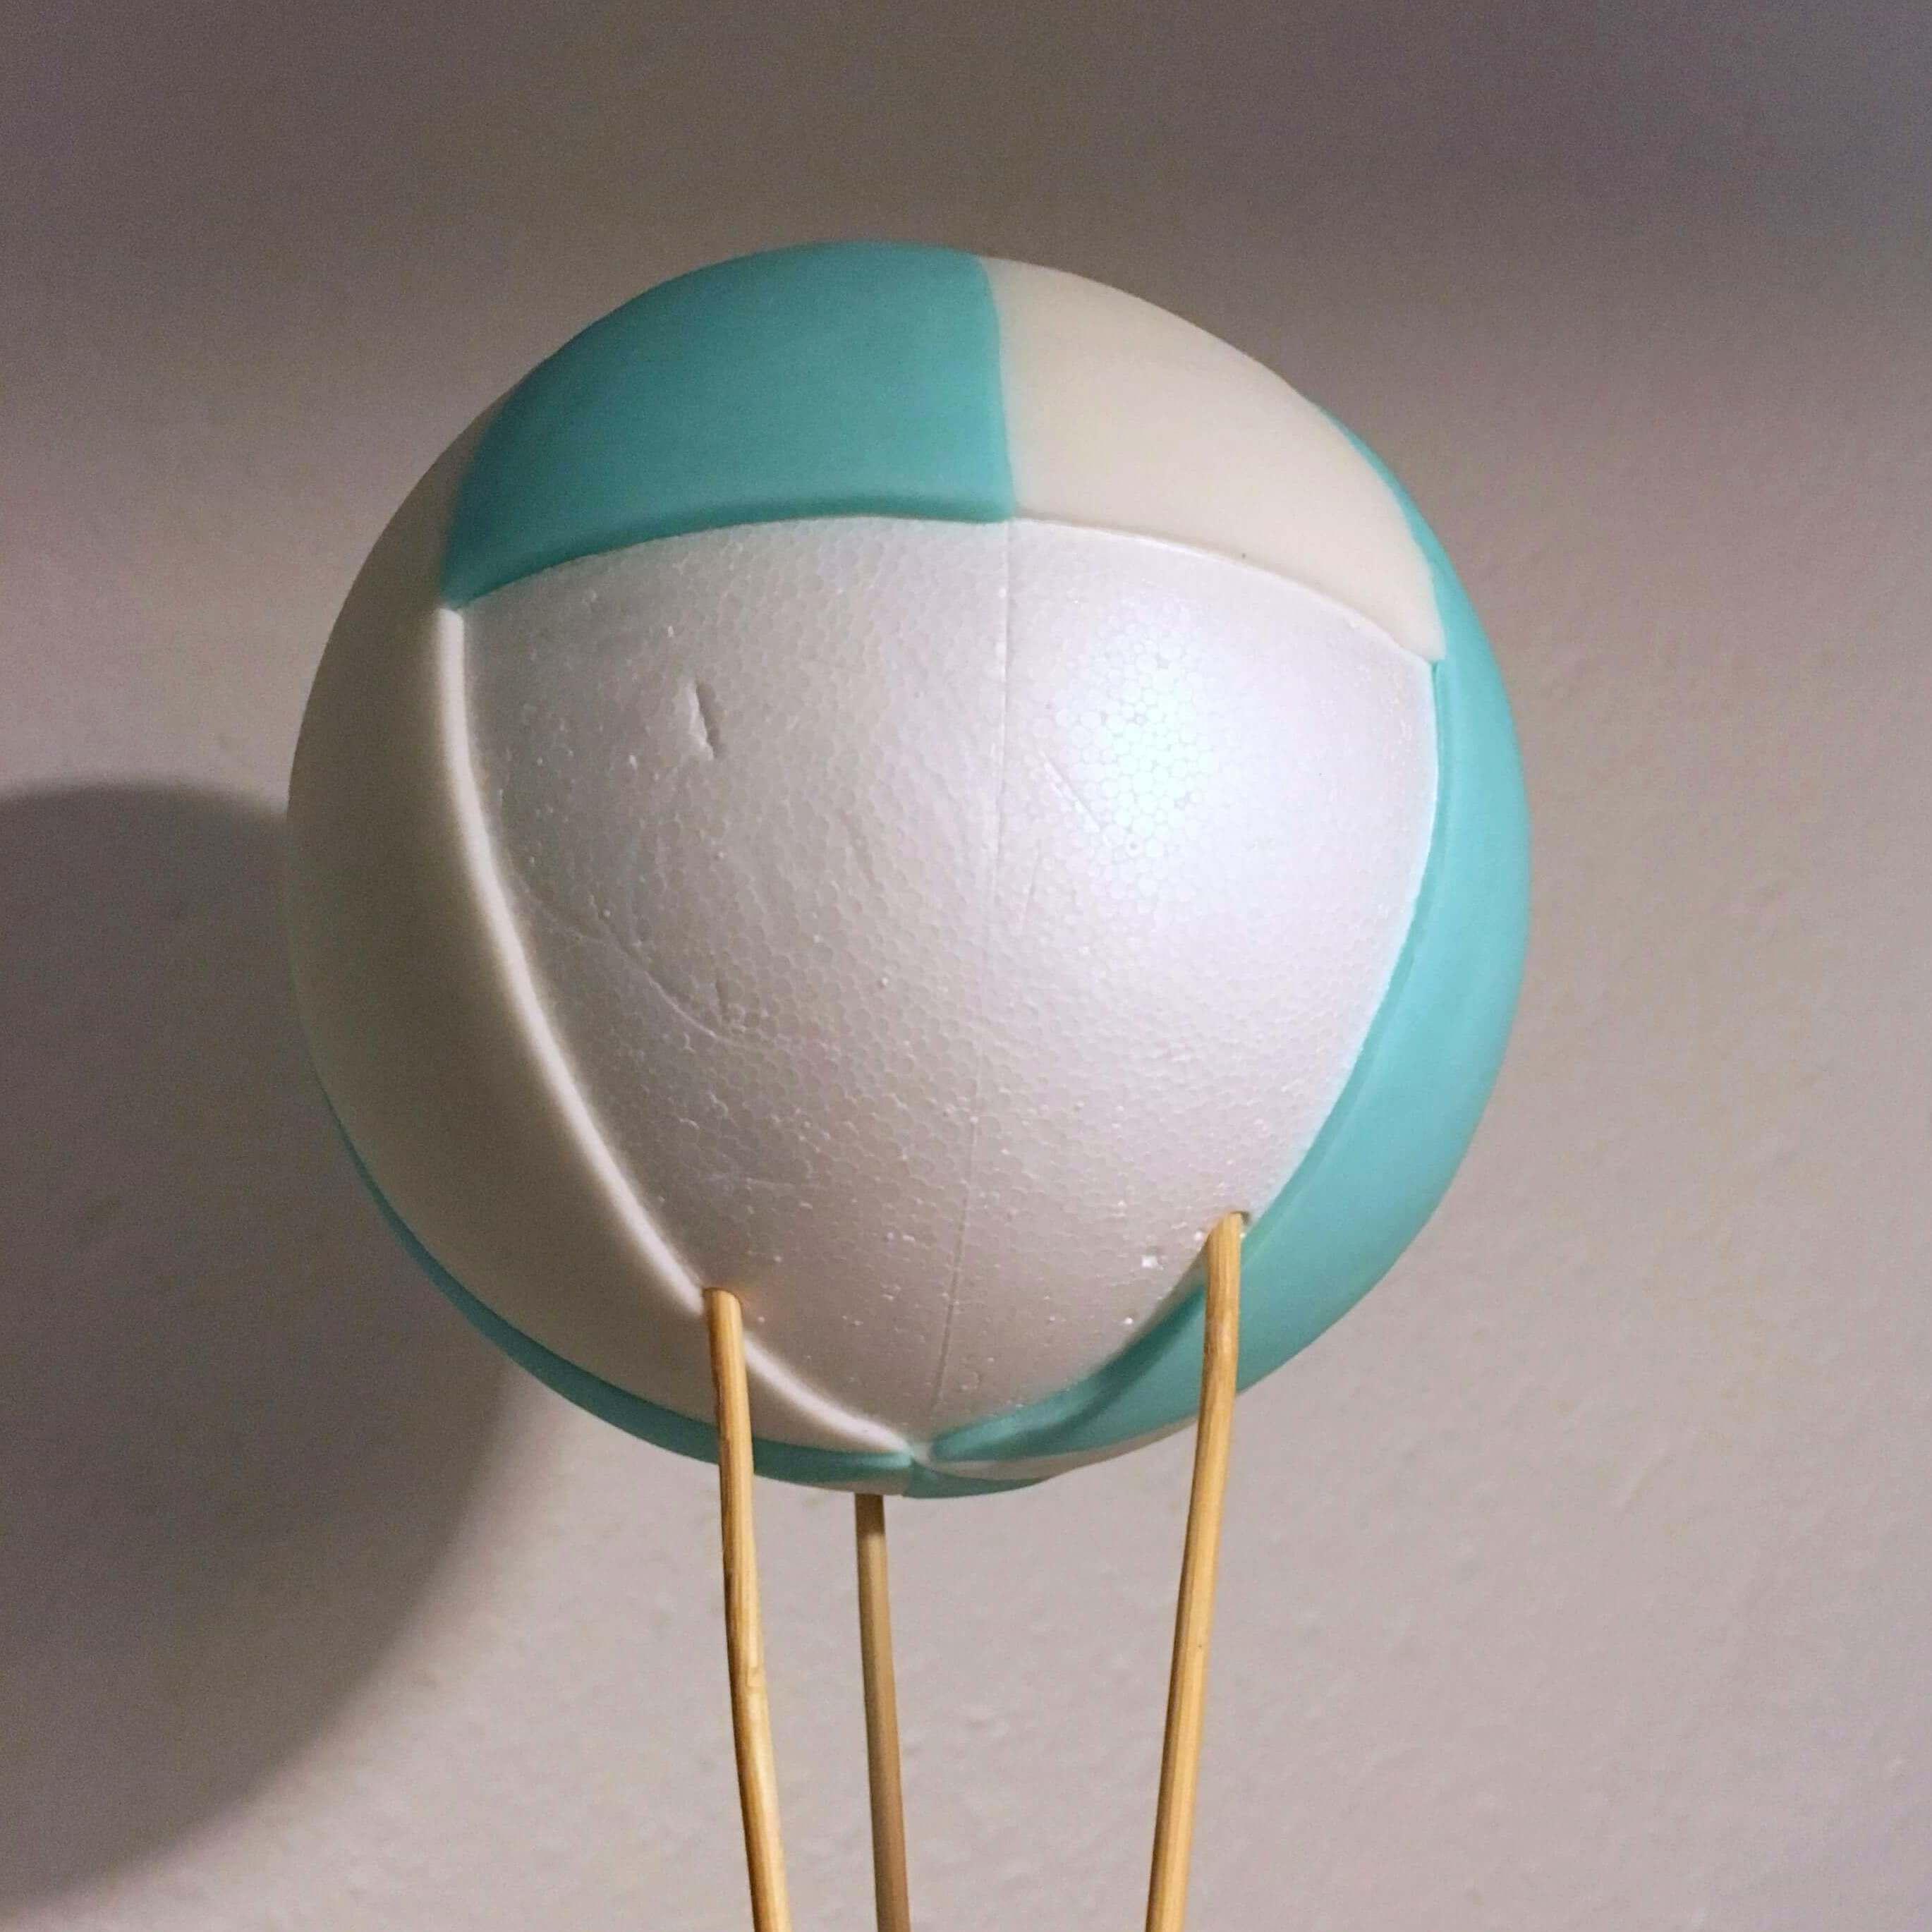 Luftballon step 2